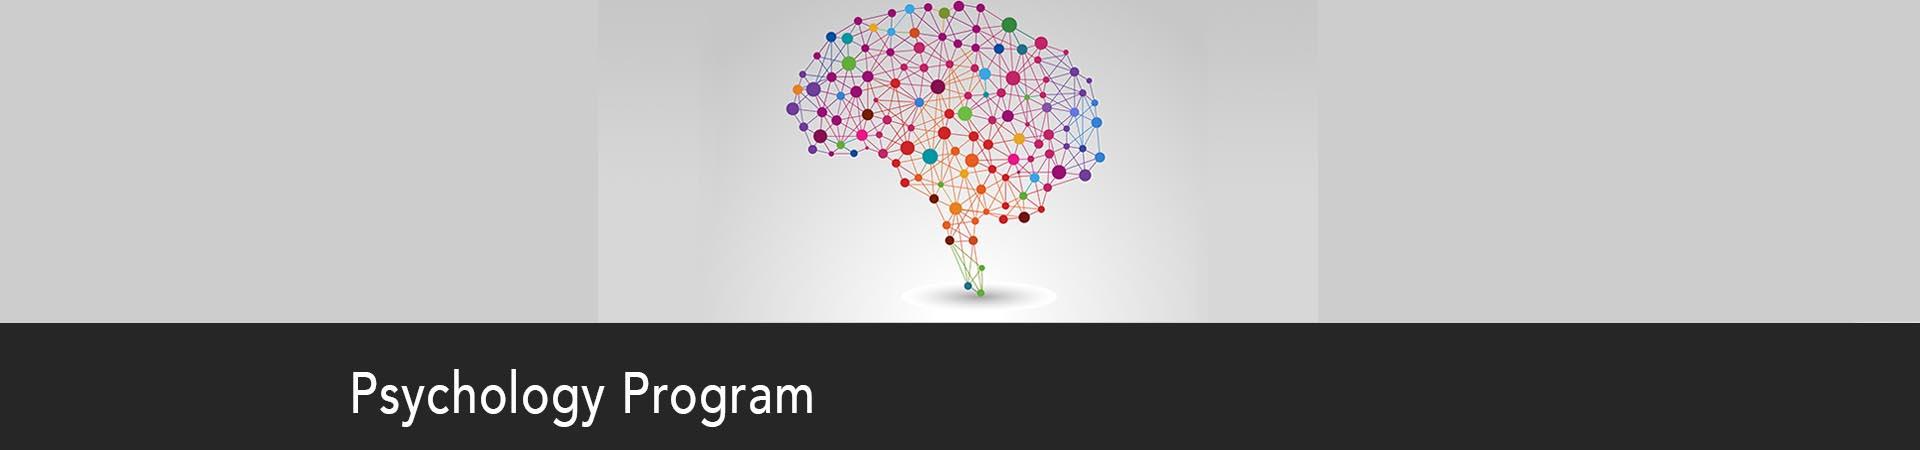 Explore the Psychology Program at NC